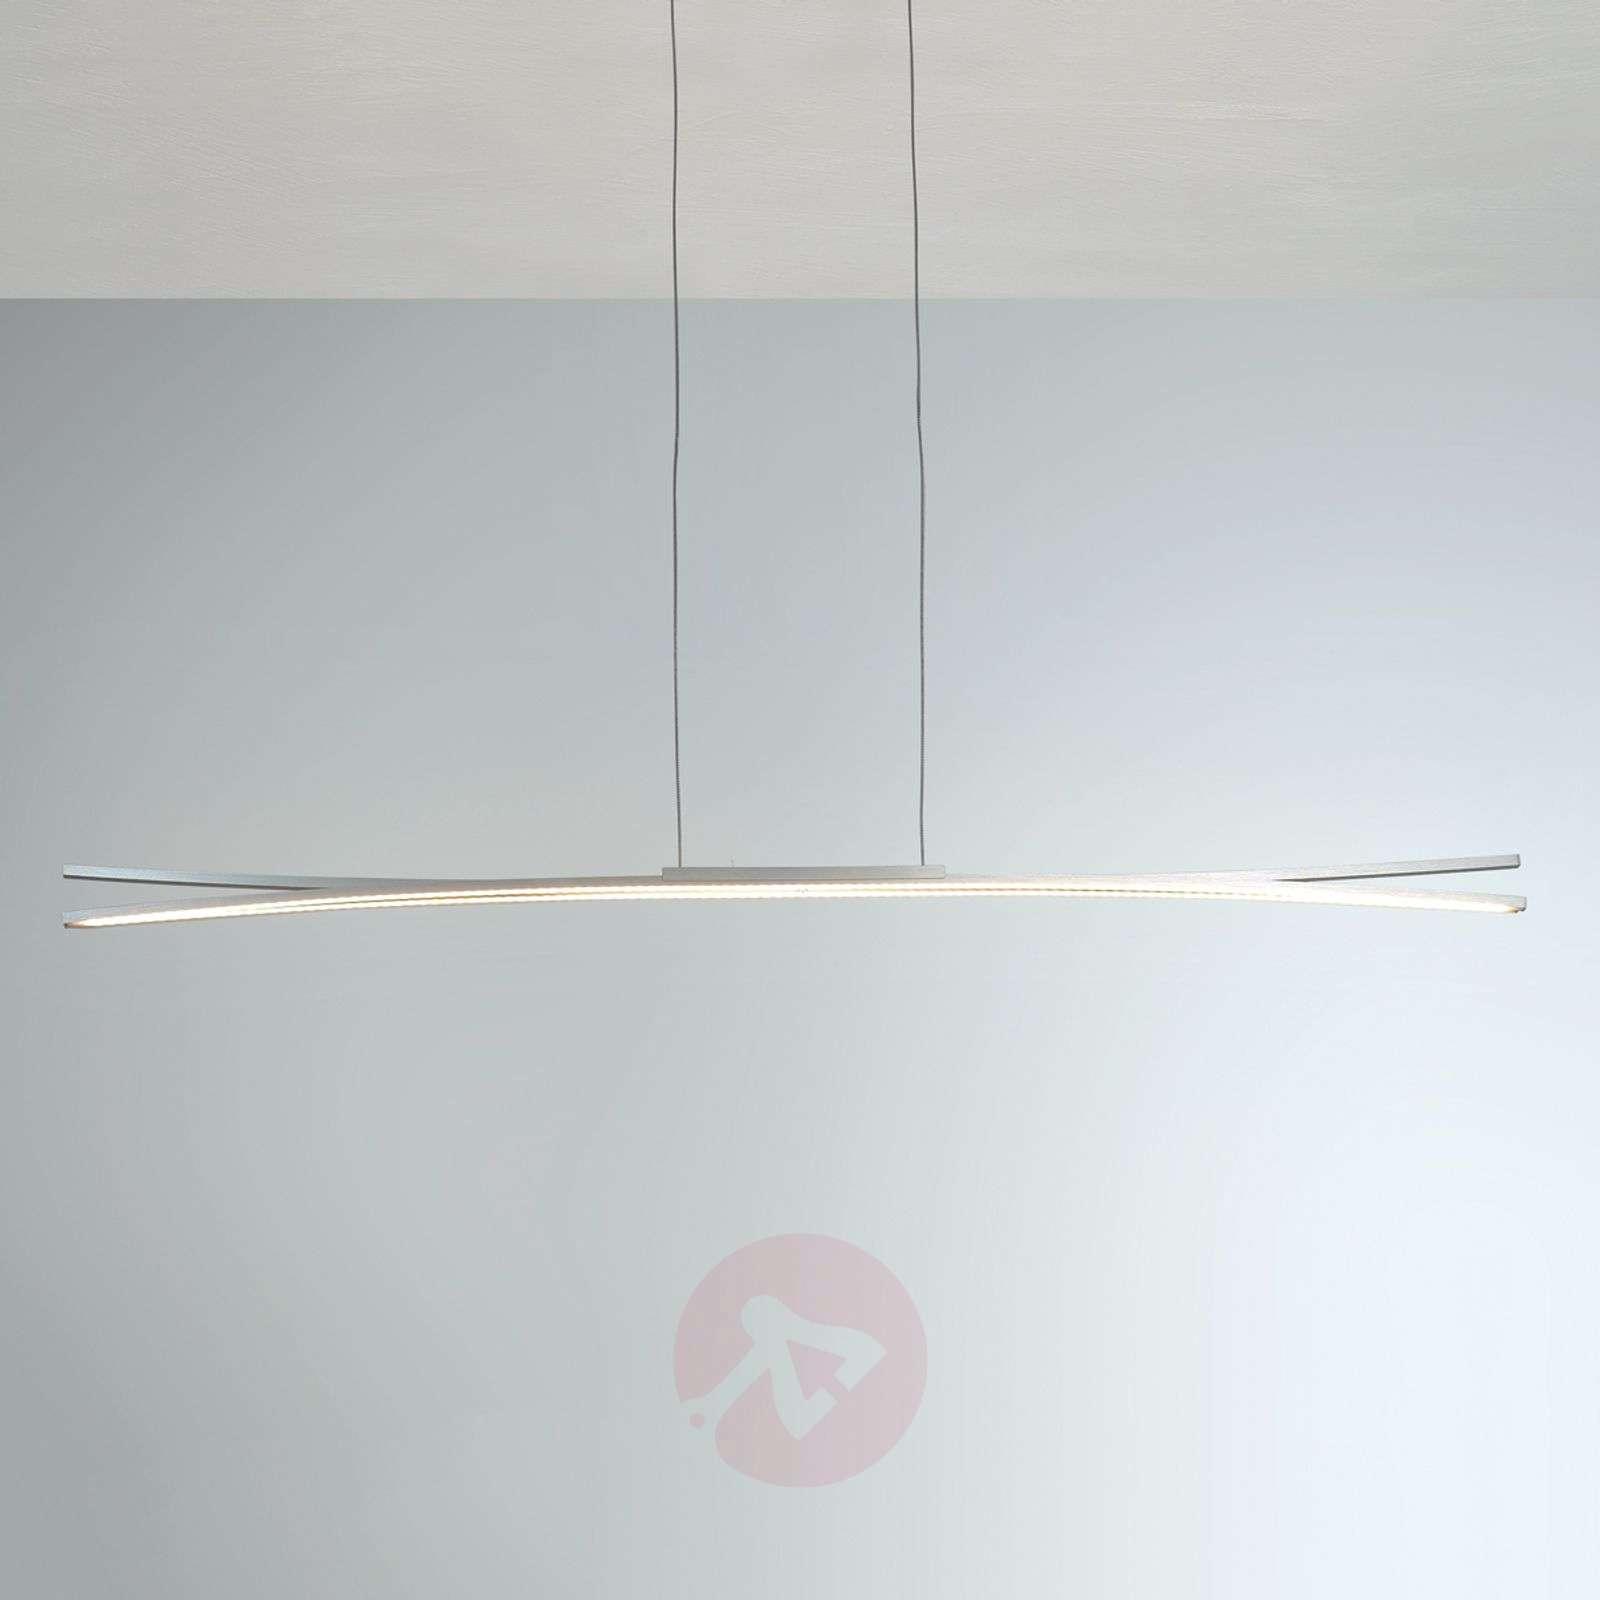 Pitkä LED-riippuvalaisin Convex, LED-nauhat-1556118-01